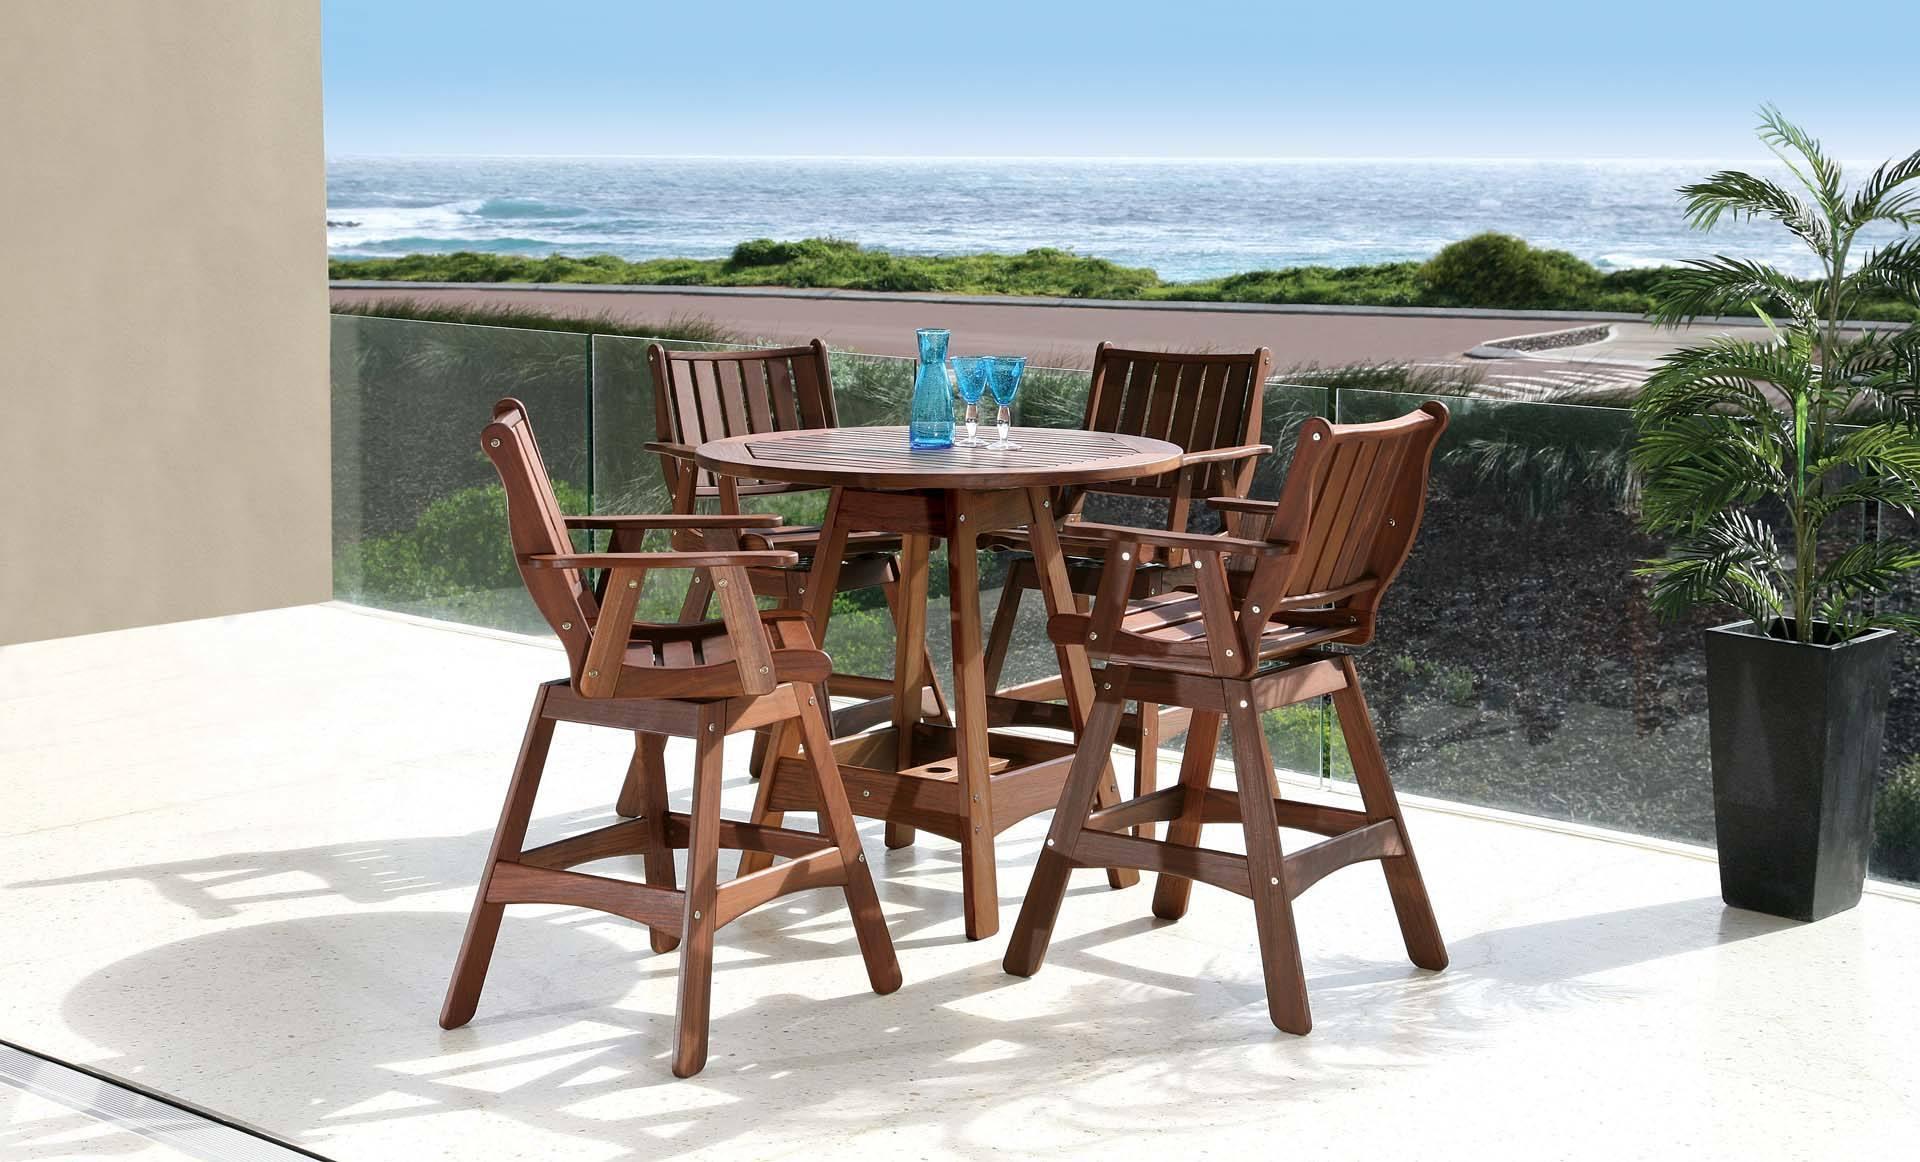 Jensen Leisure Capri Hi Dining Table with Integra Swivel